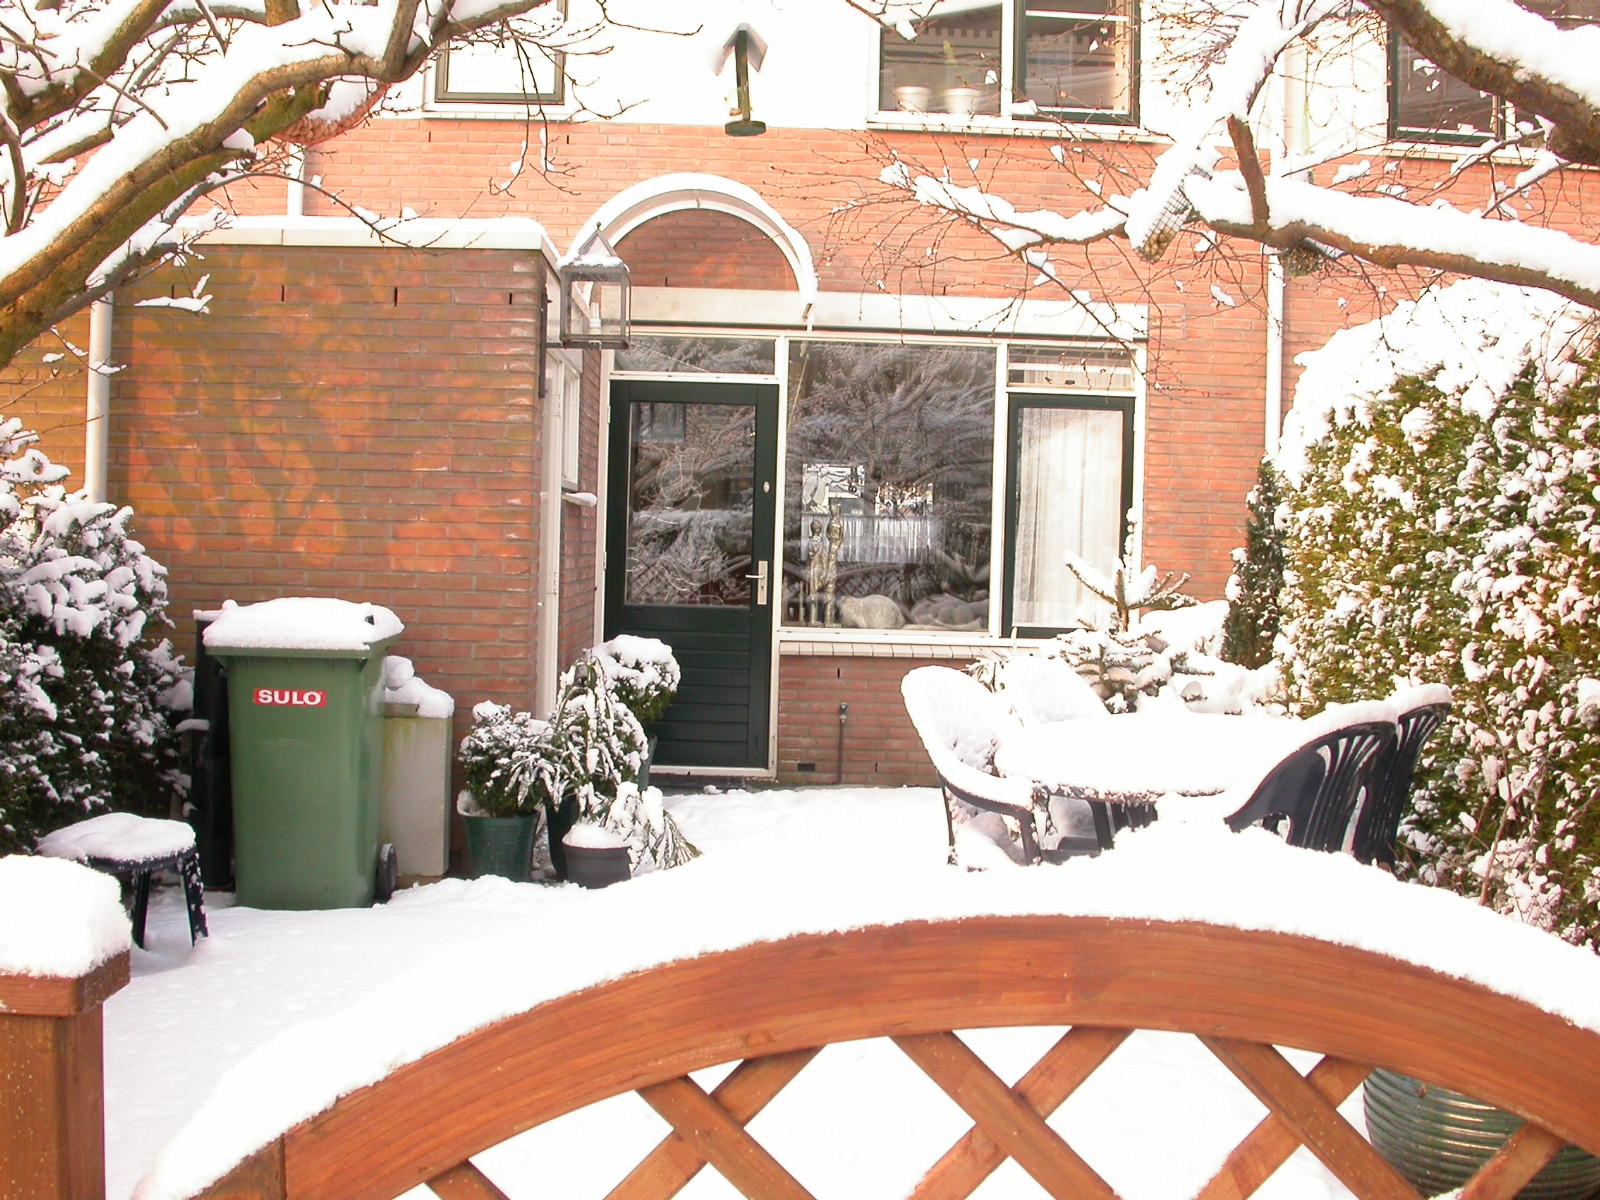 eva garden house backgarden snow snowy blanket winter cold white